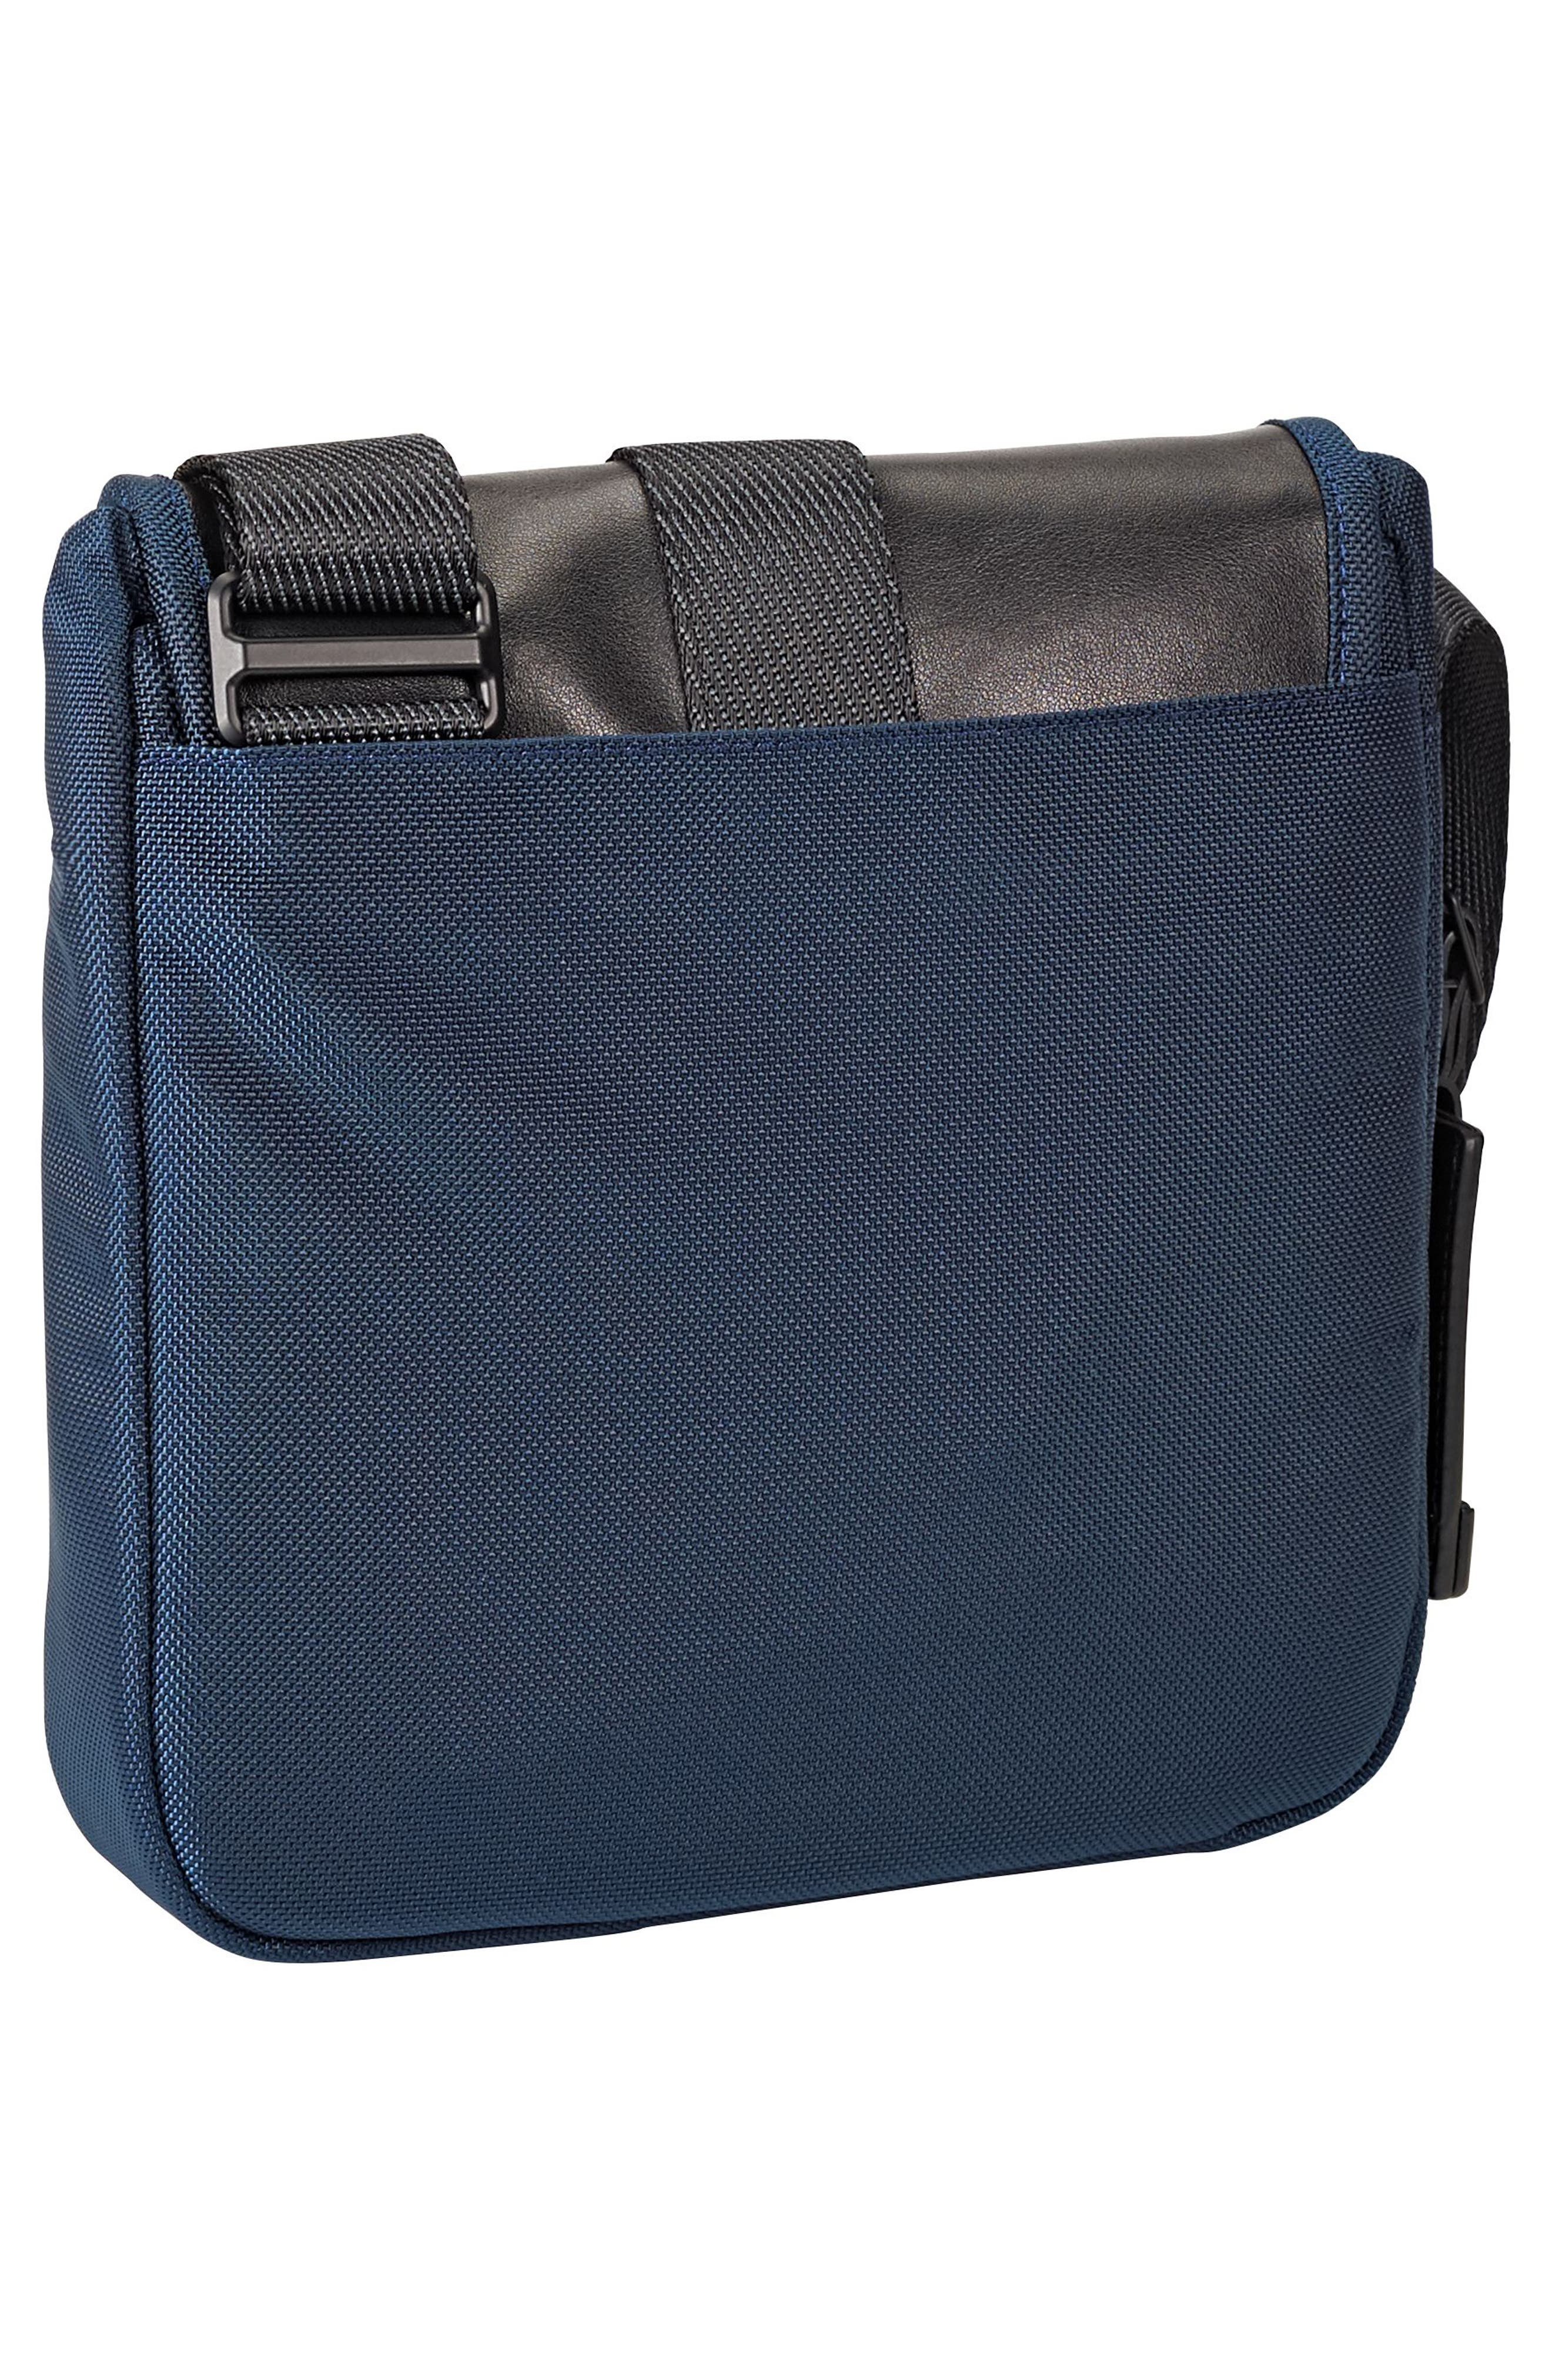 Alpha Bravo - Barton Crossbody Bag,                             Alternate thumbnail 2, color,                             NAVY